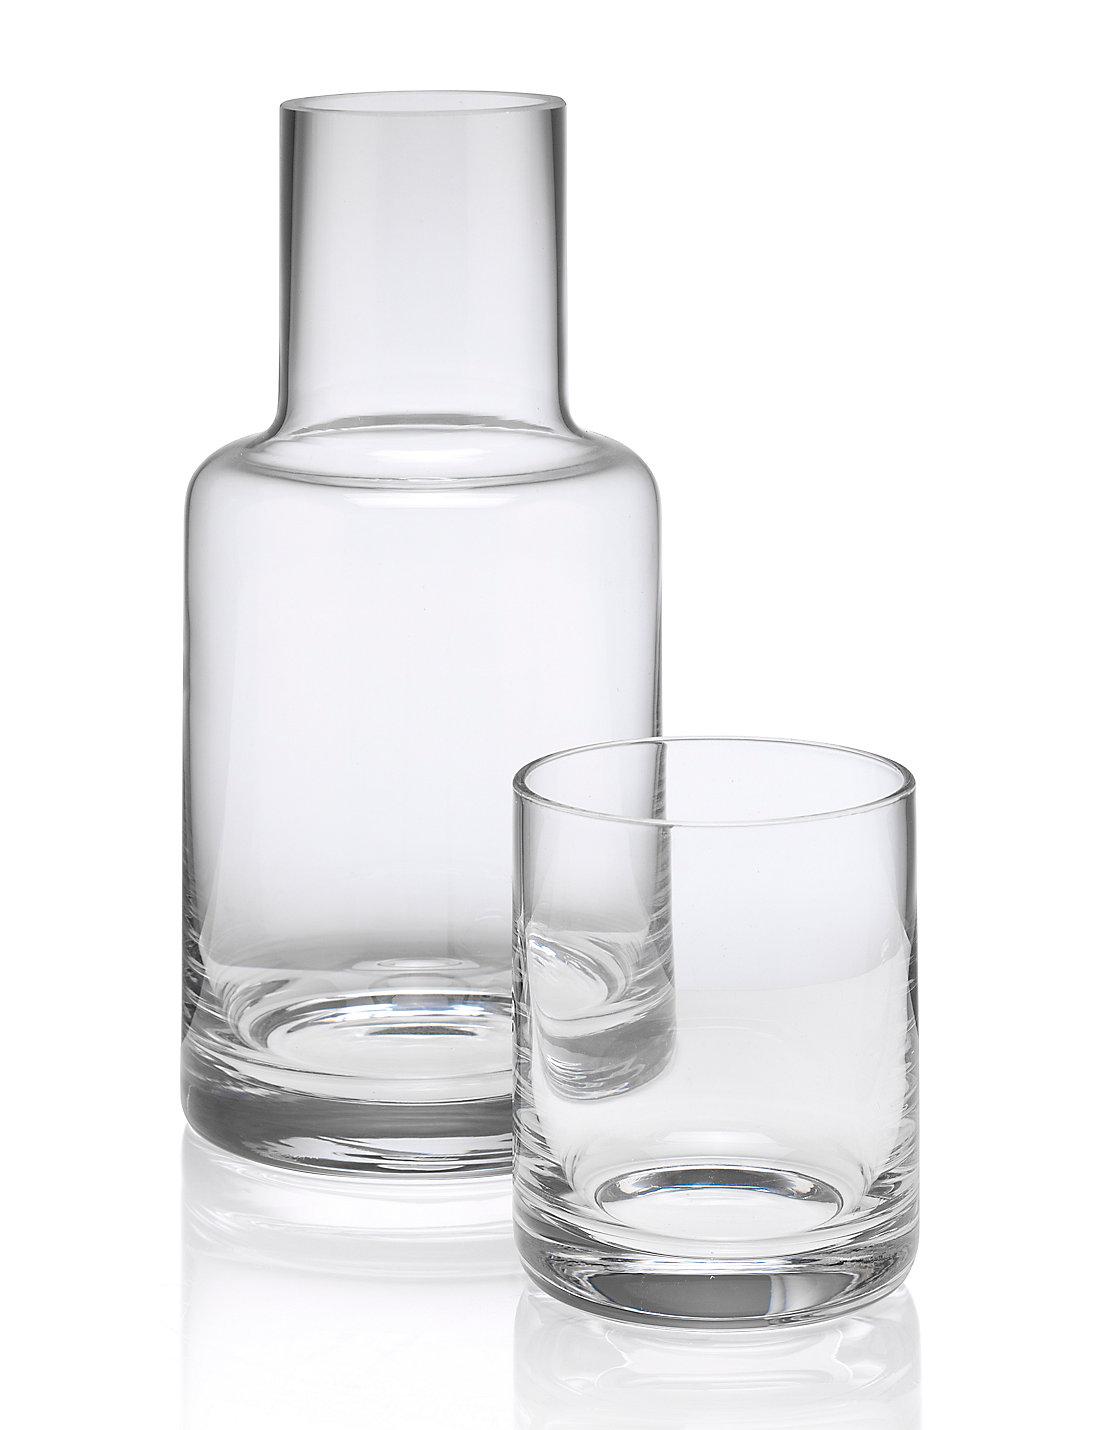 Carafe & Glass